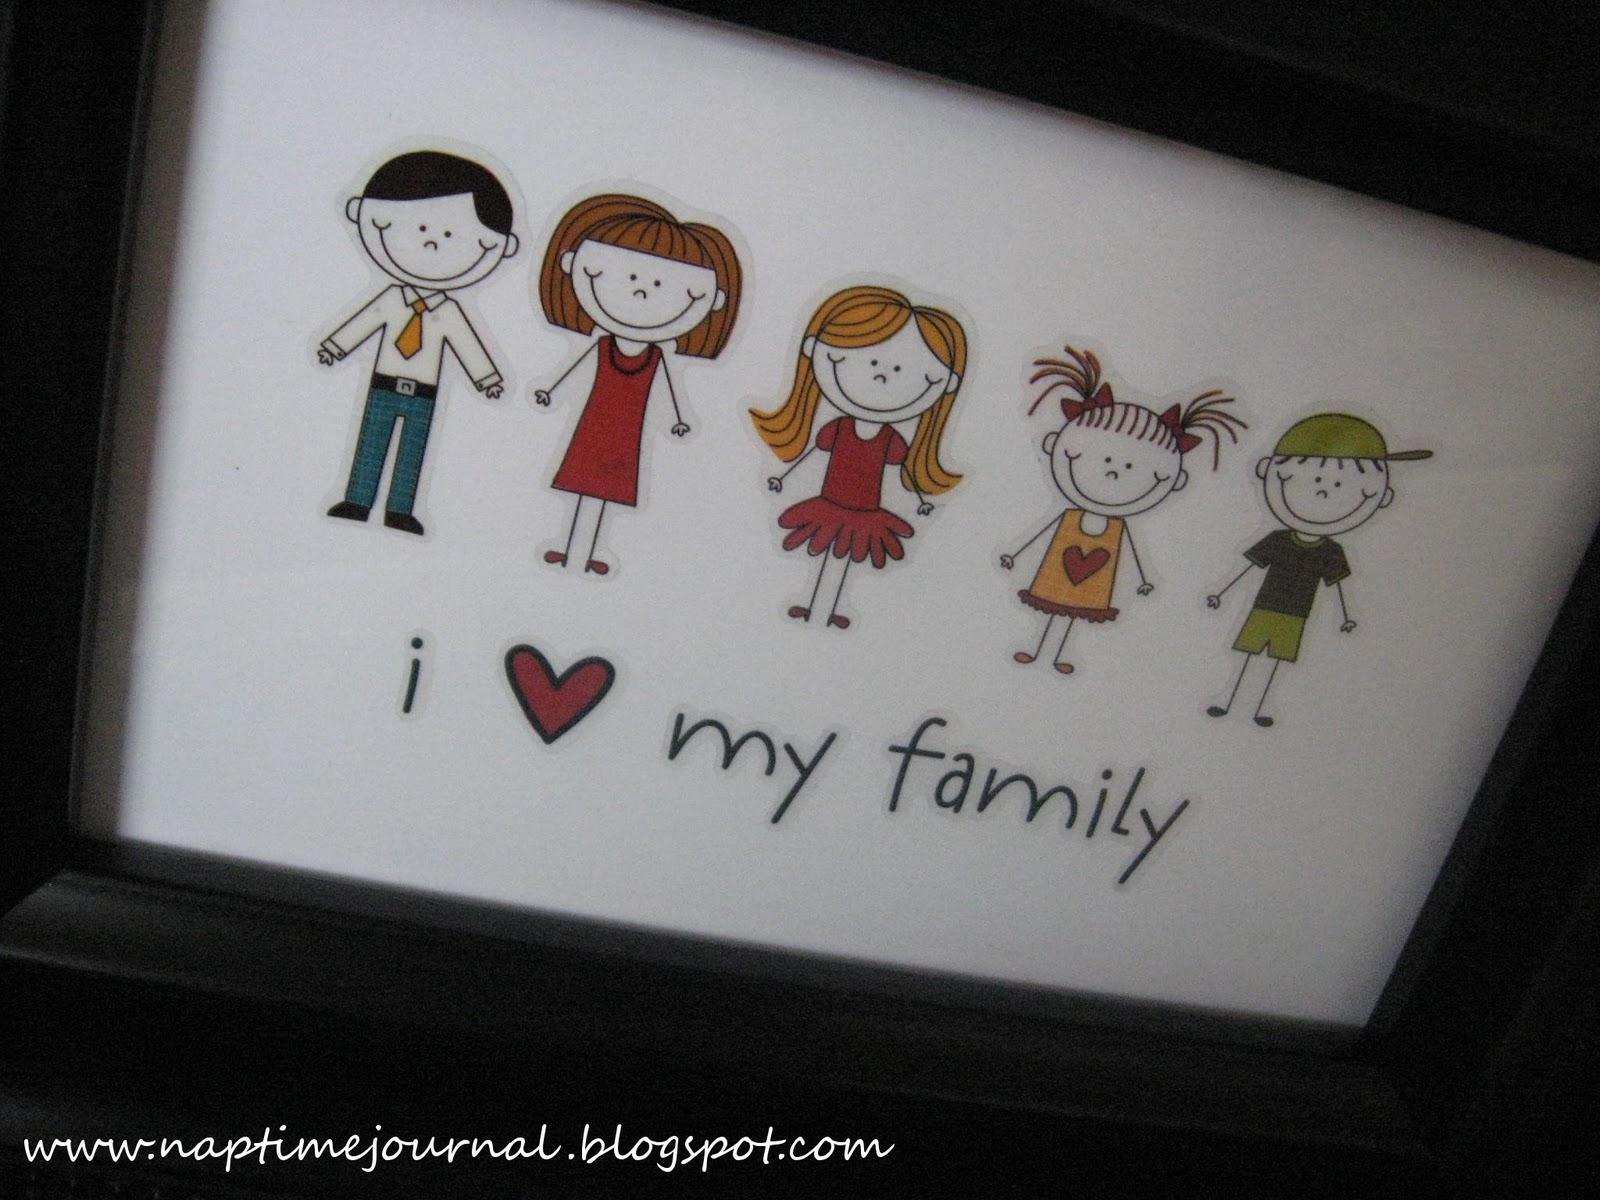 Nap Time Journal I love my Family FrameDIY 1600x1200